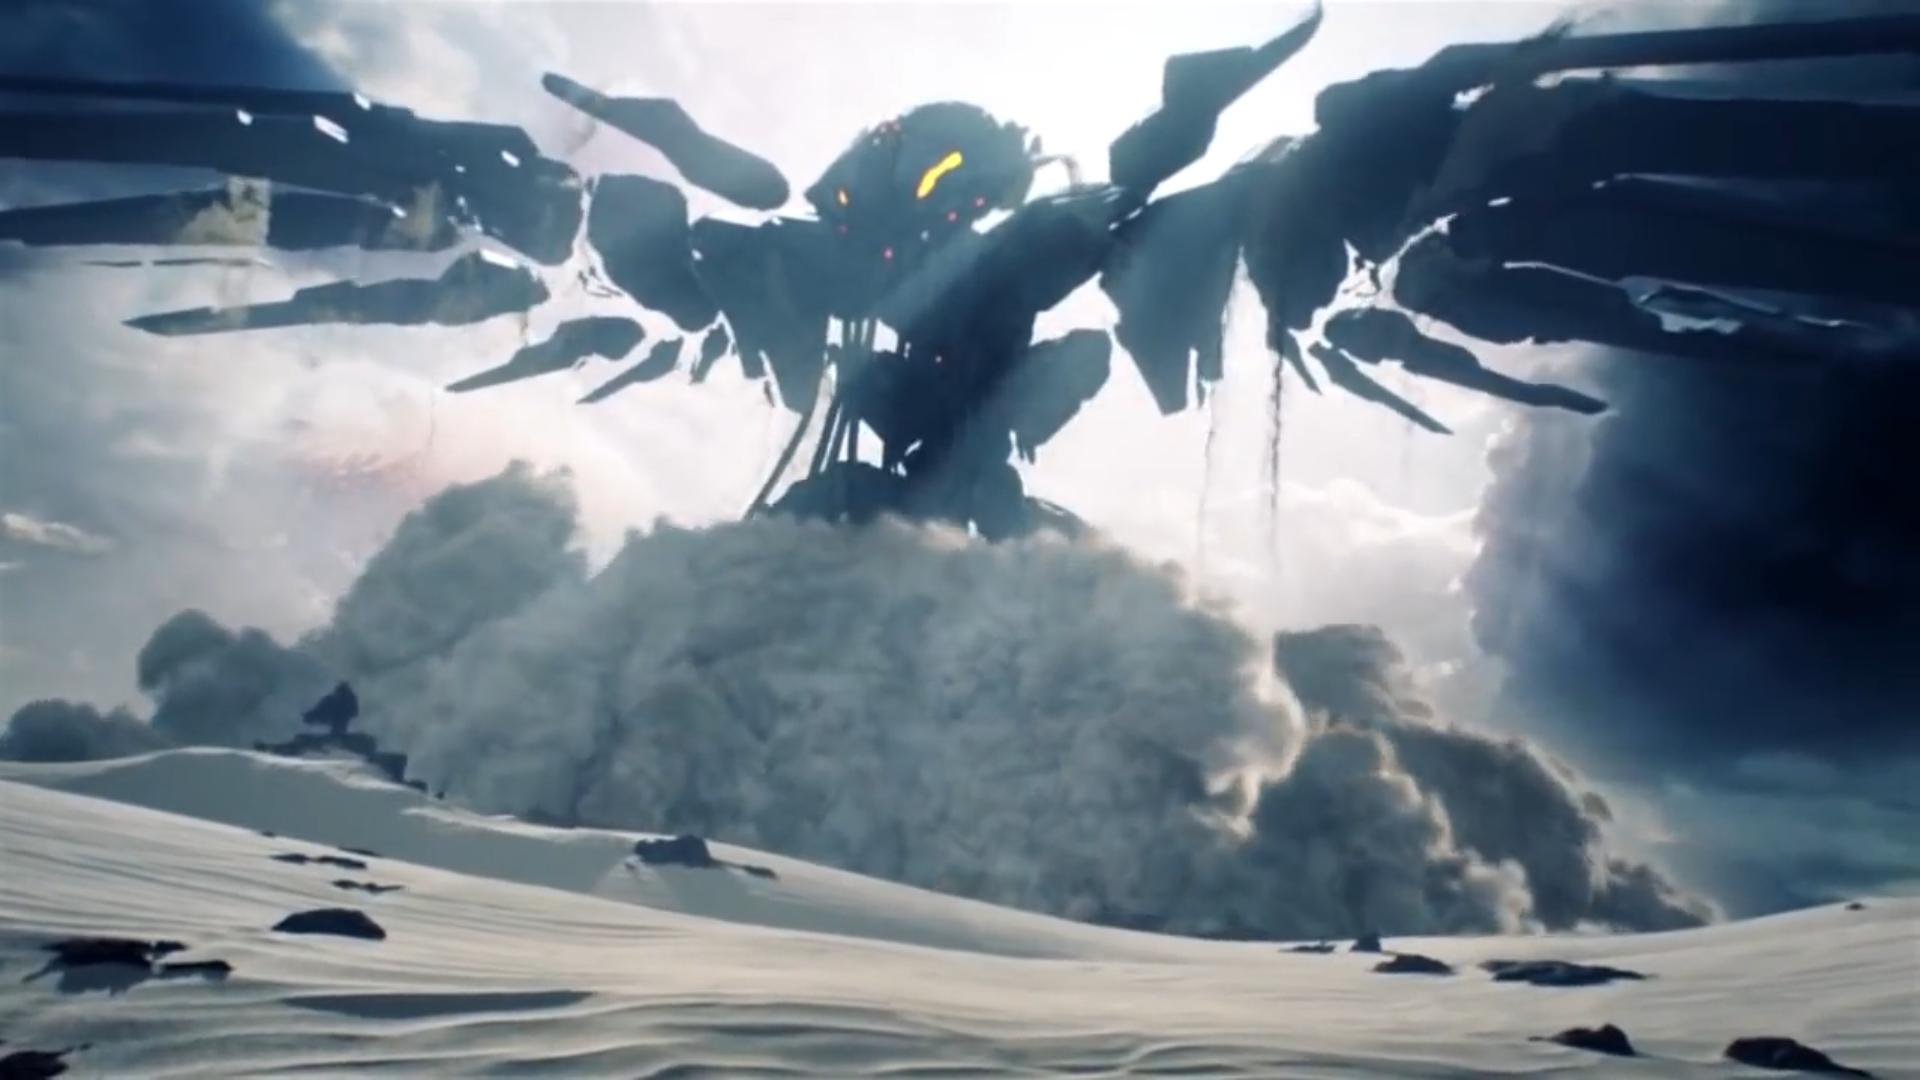 Halo 5 Guardians Wallpaper: Halo 5 Guardians Wallpapers